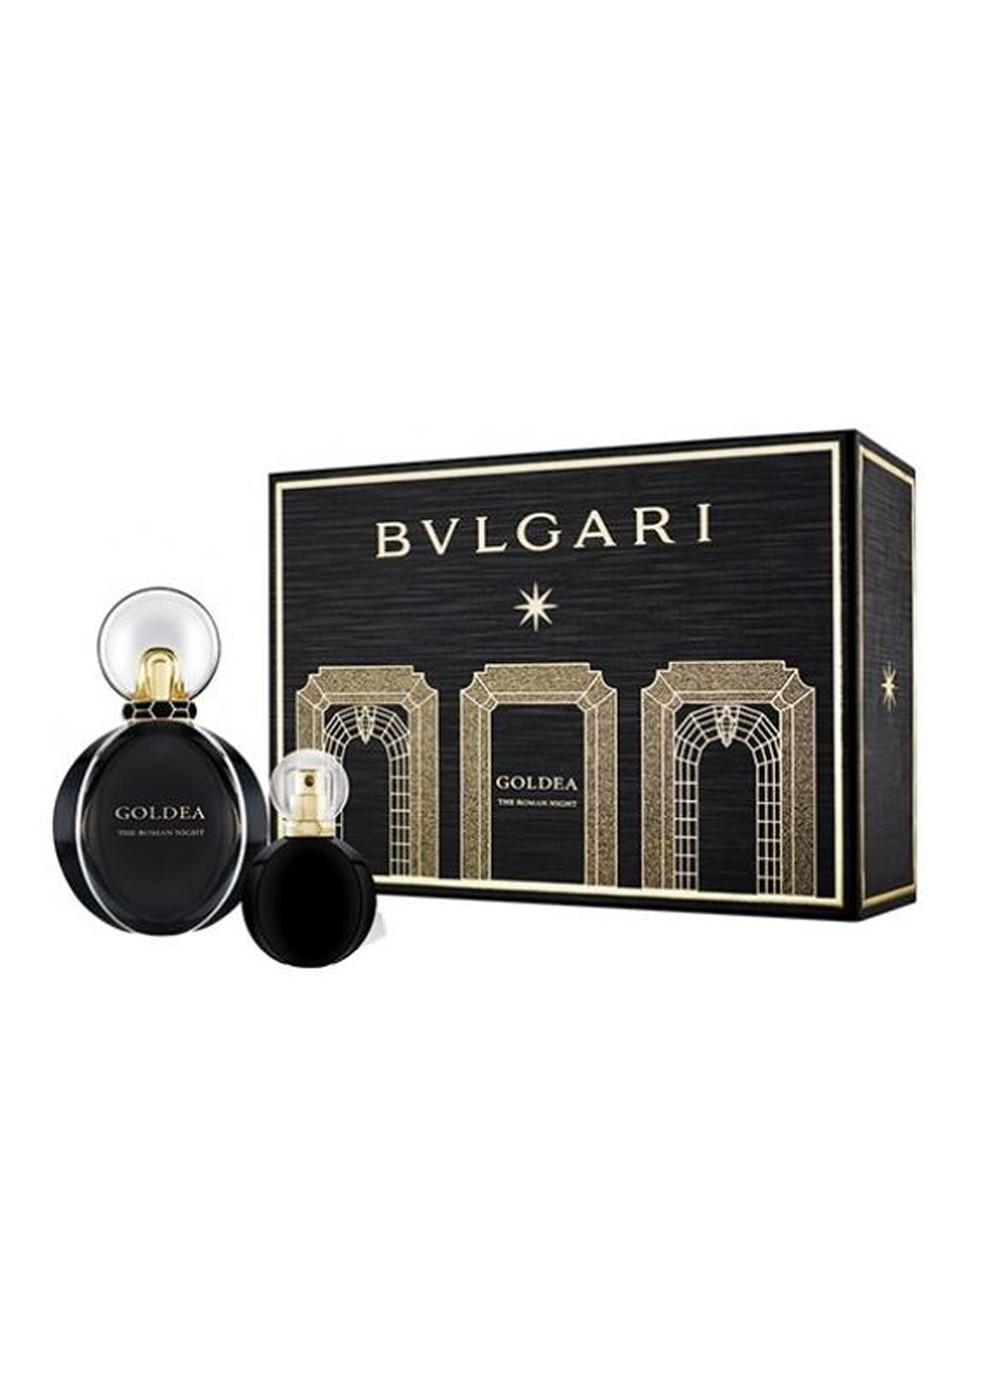 competitive price e42b0 368b4 ブルガリ ゴルデアローマンナイトギフトセット|OTHER|香水|【お ...